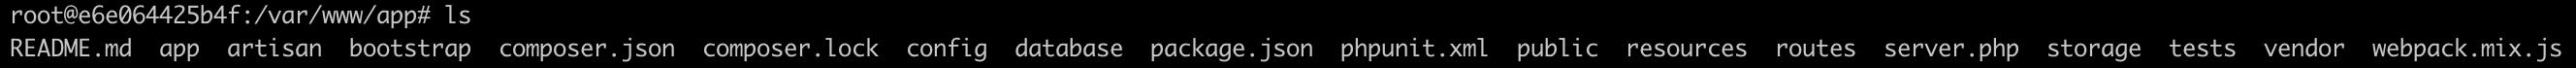 appの下にLaravelのファイル群を生成できた